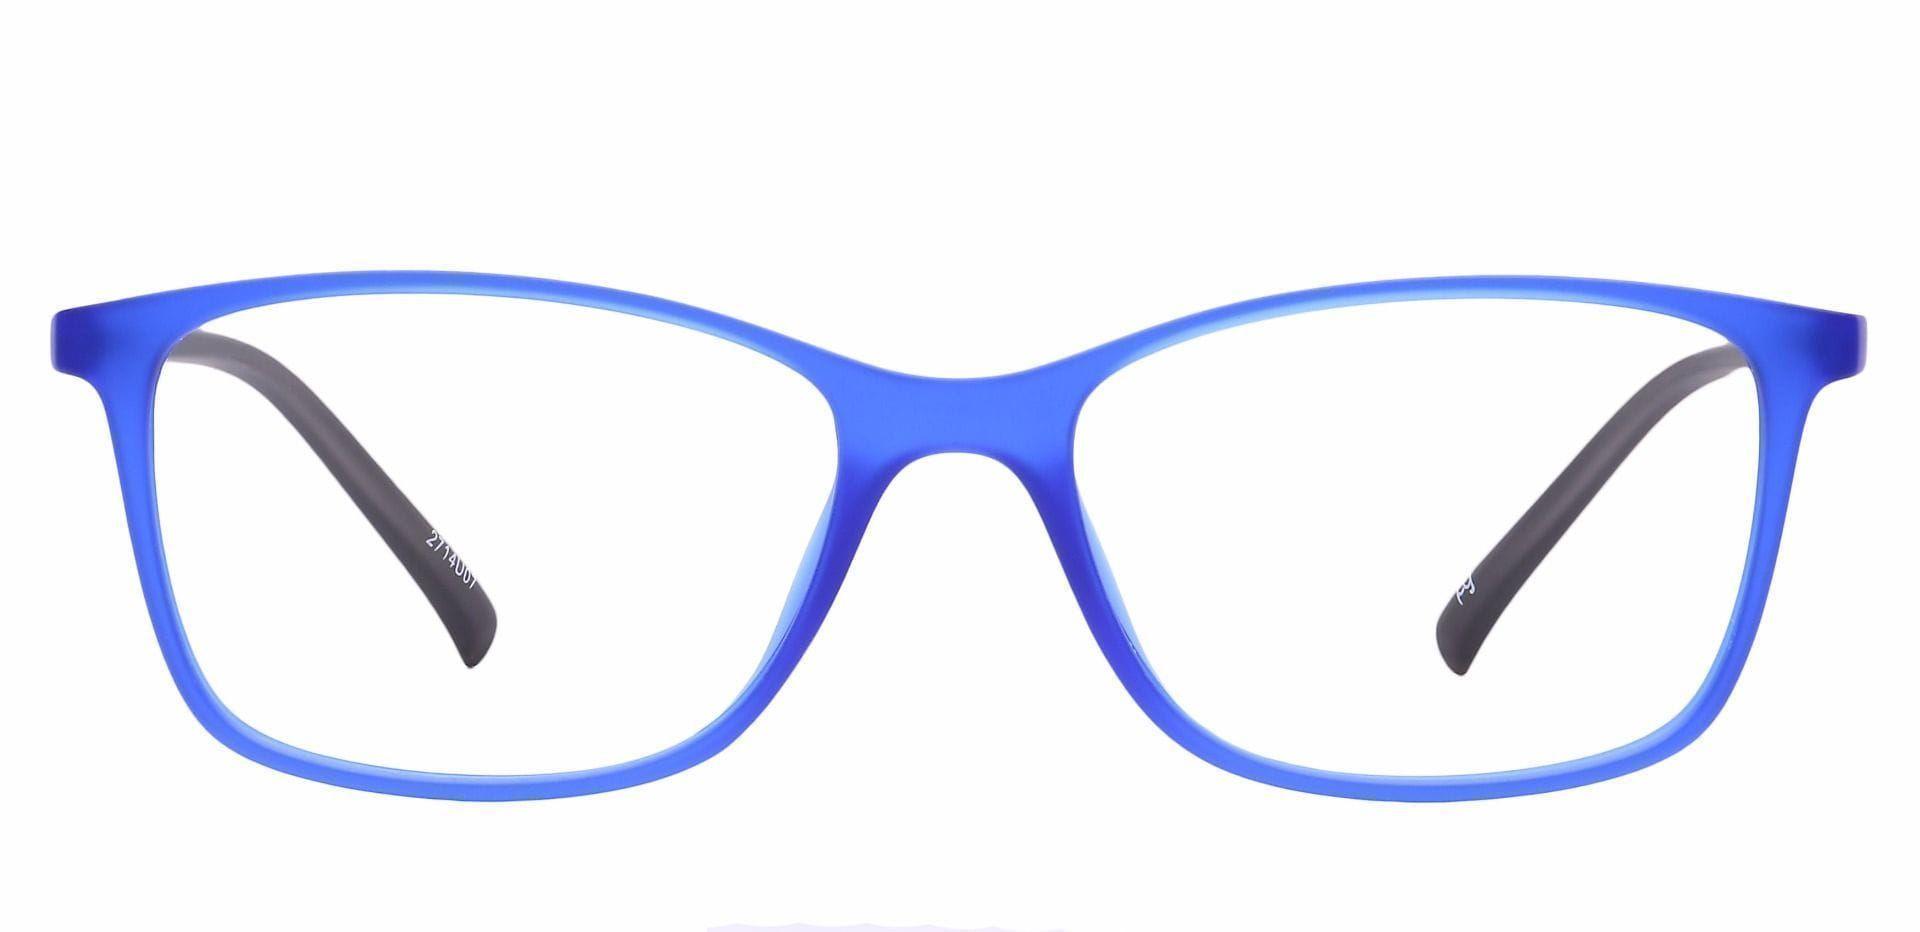 Key Rectangle Prescription Glasses - Blue